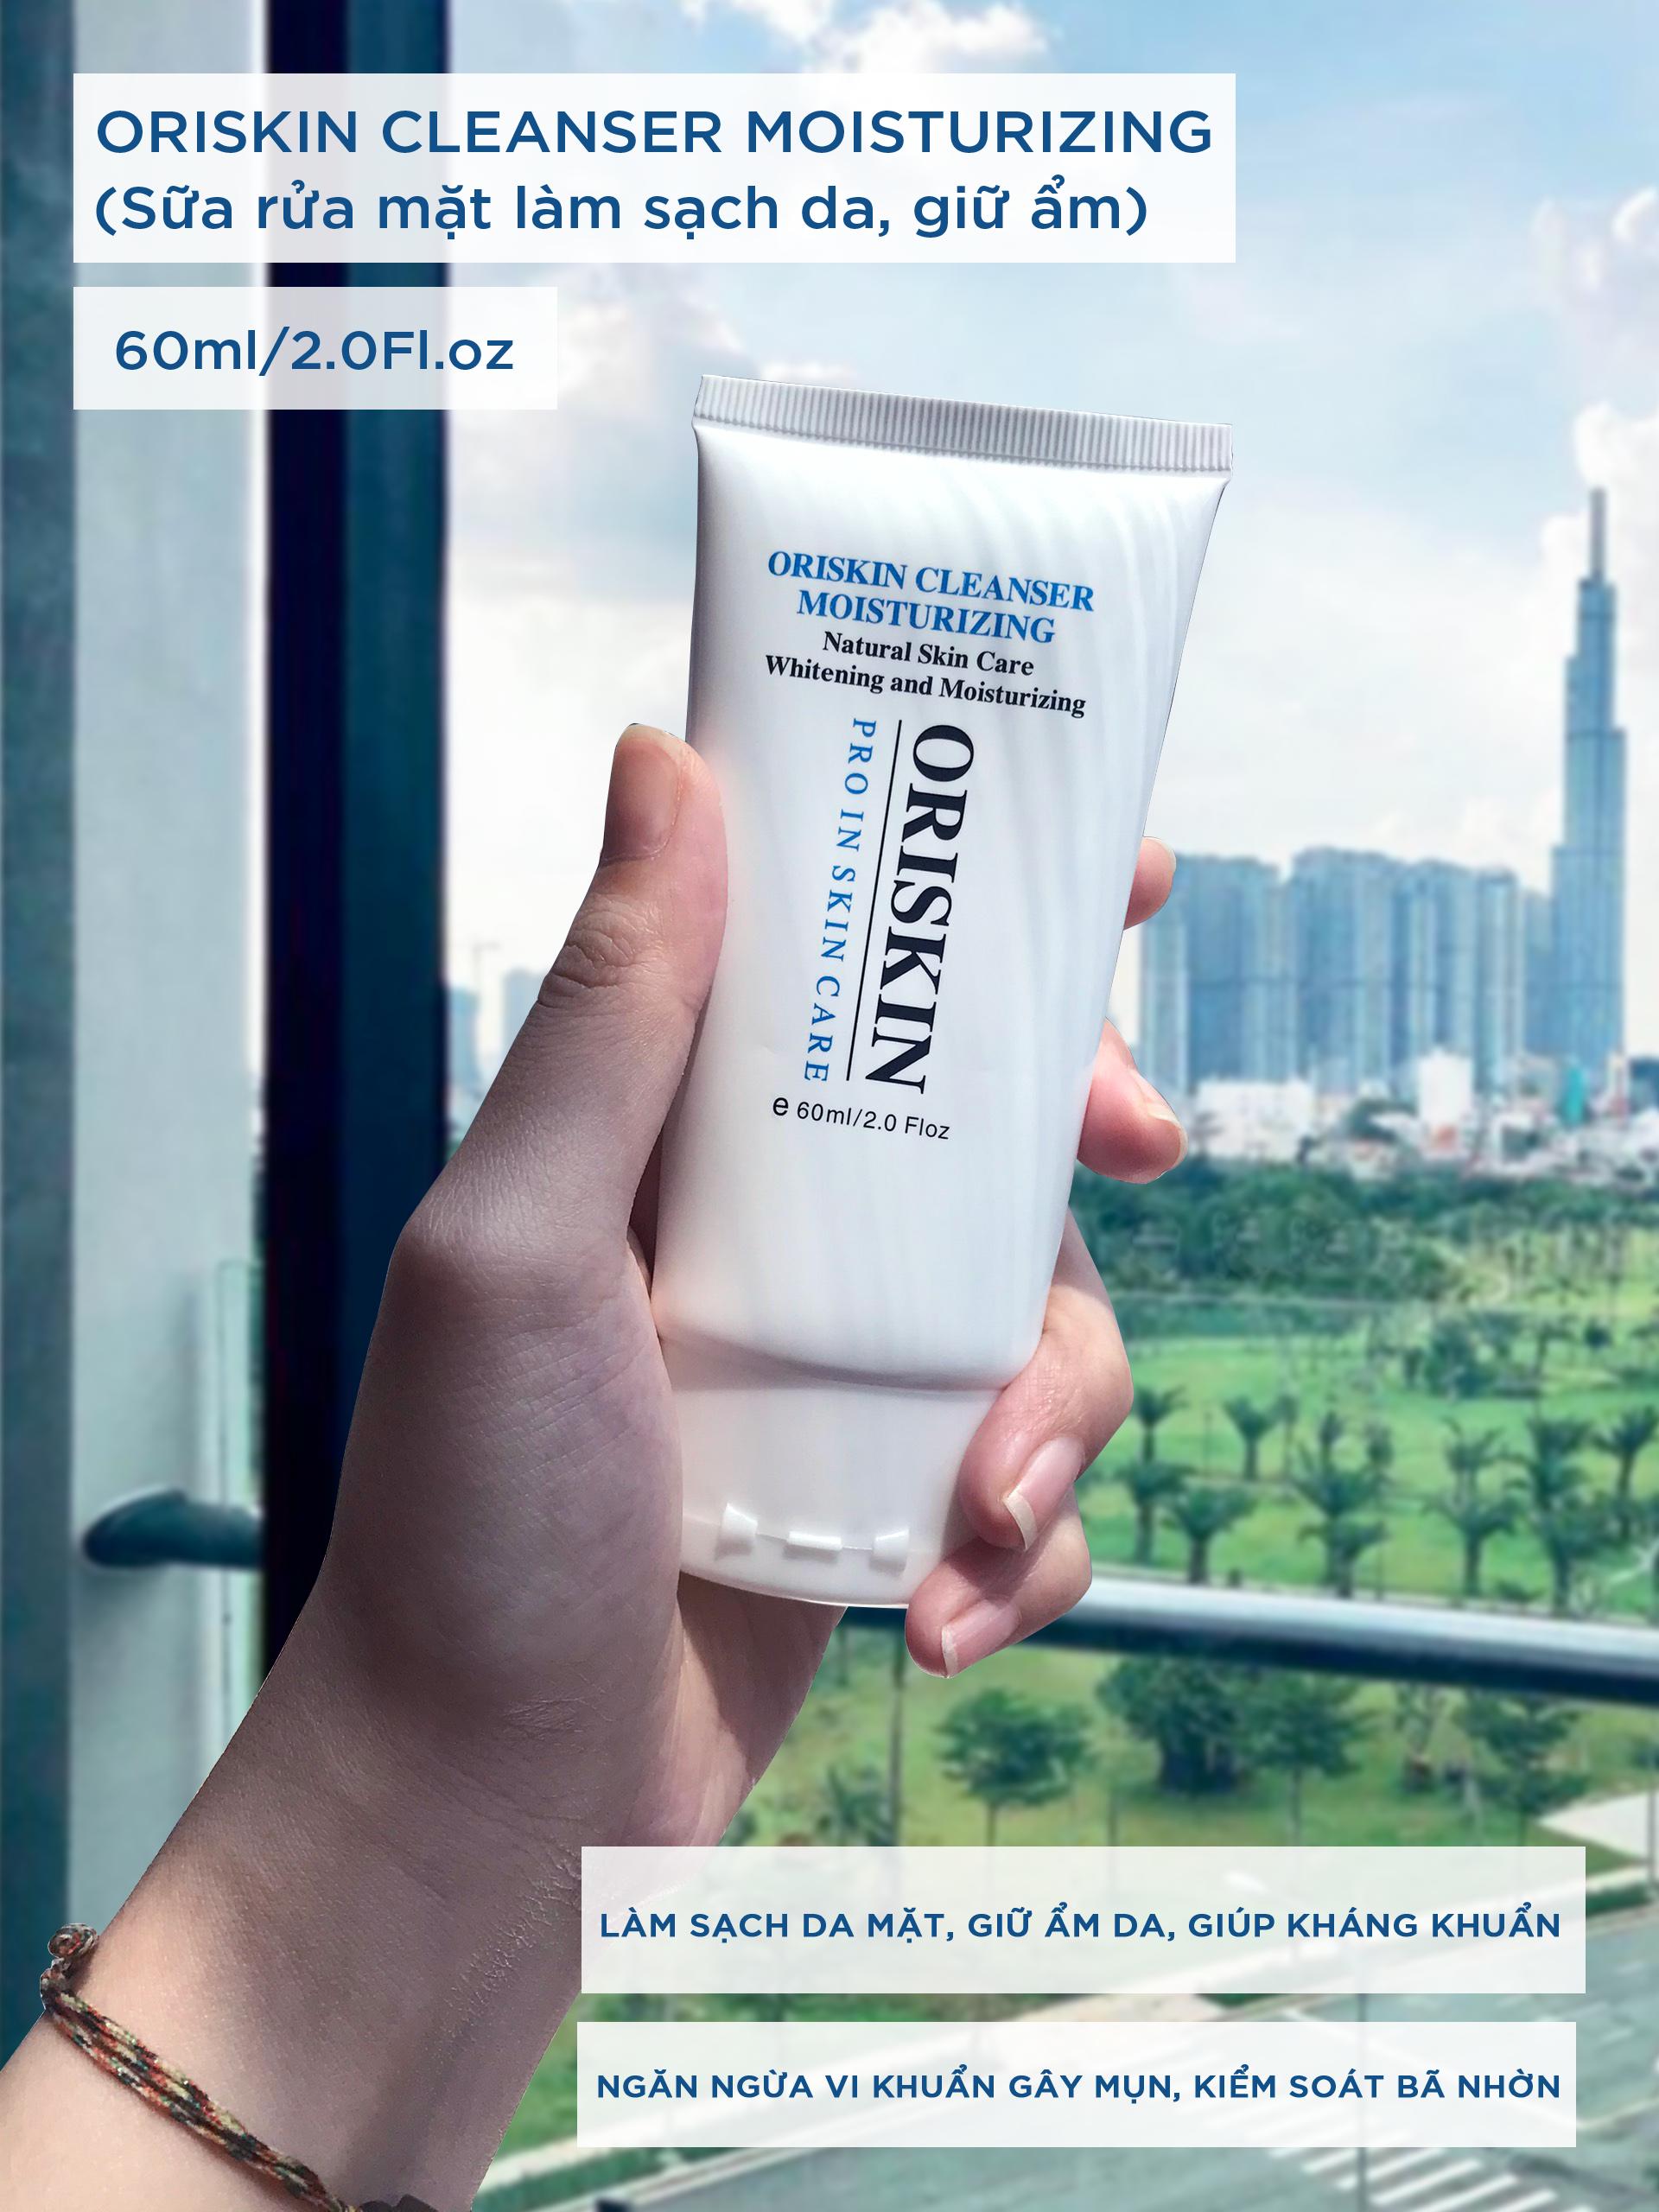 Sữa Rửa Mặt Làm Sạch Da, Oriskin Cleanser Moisturizing ( Size 60ml )